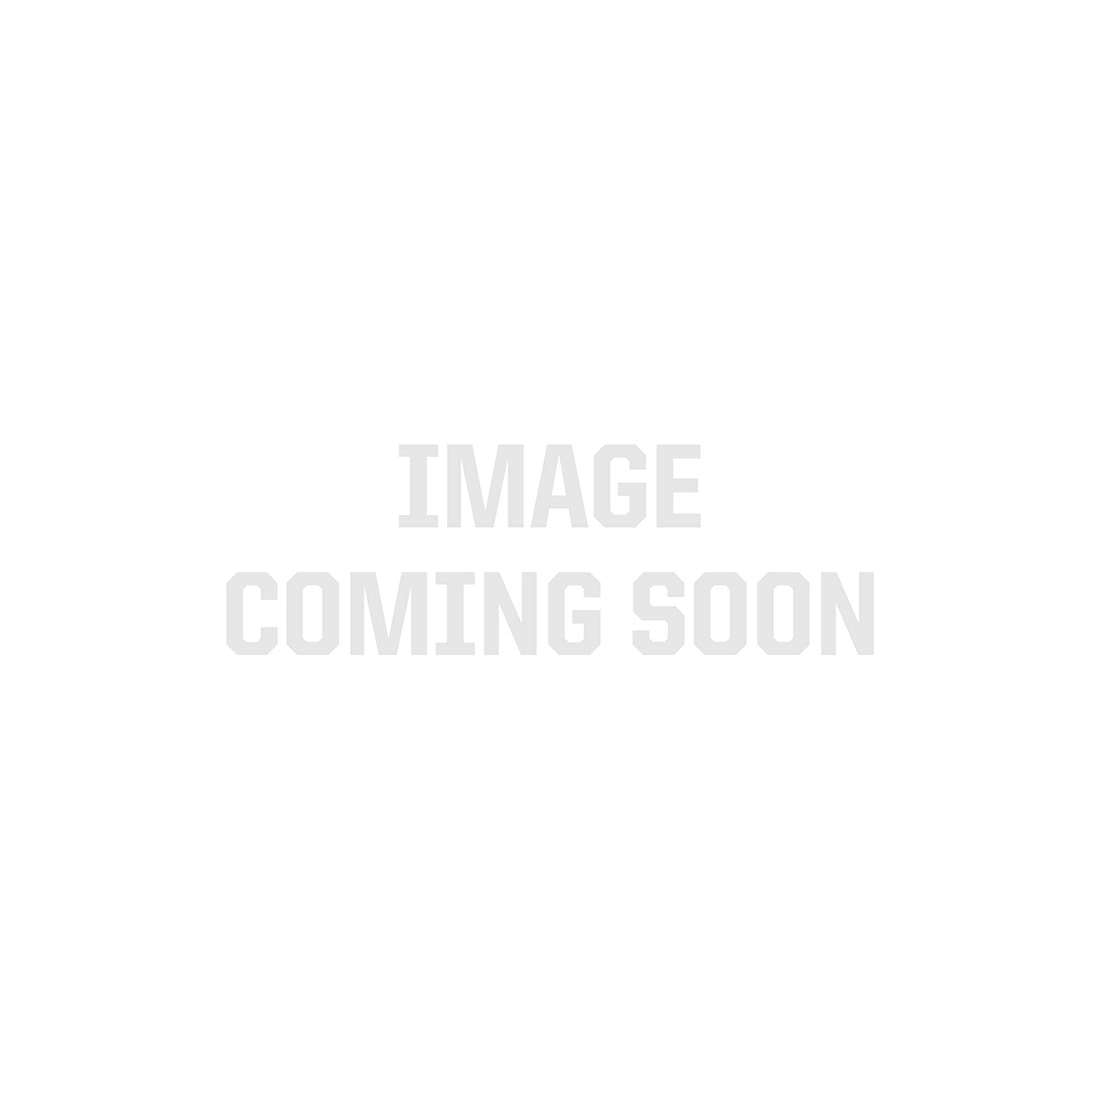 Waterproof Warm White 2835 Single Row CurrentControl LED Strip Light, 60/m, 10mm wide, Sample Kit